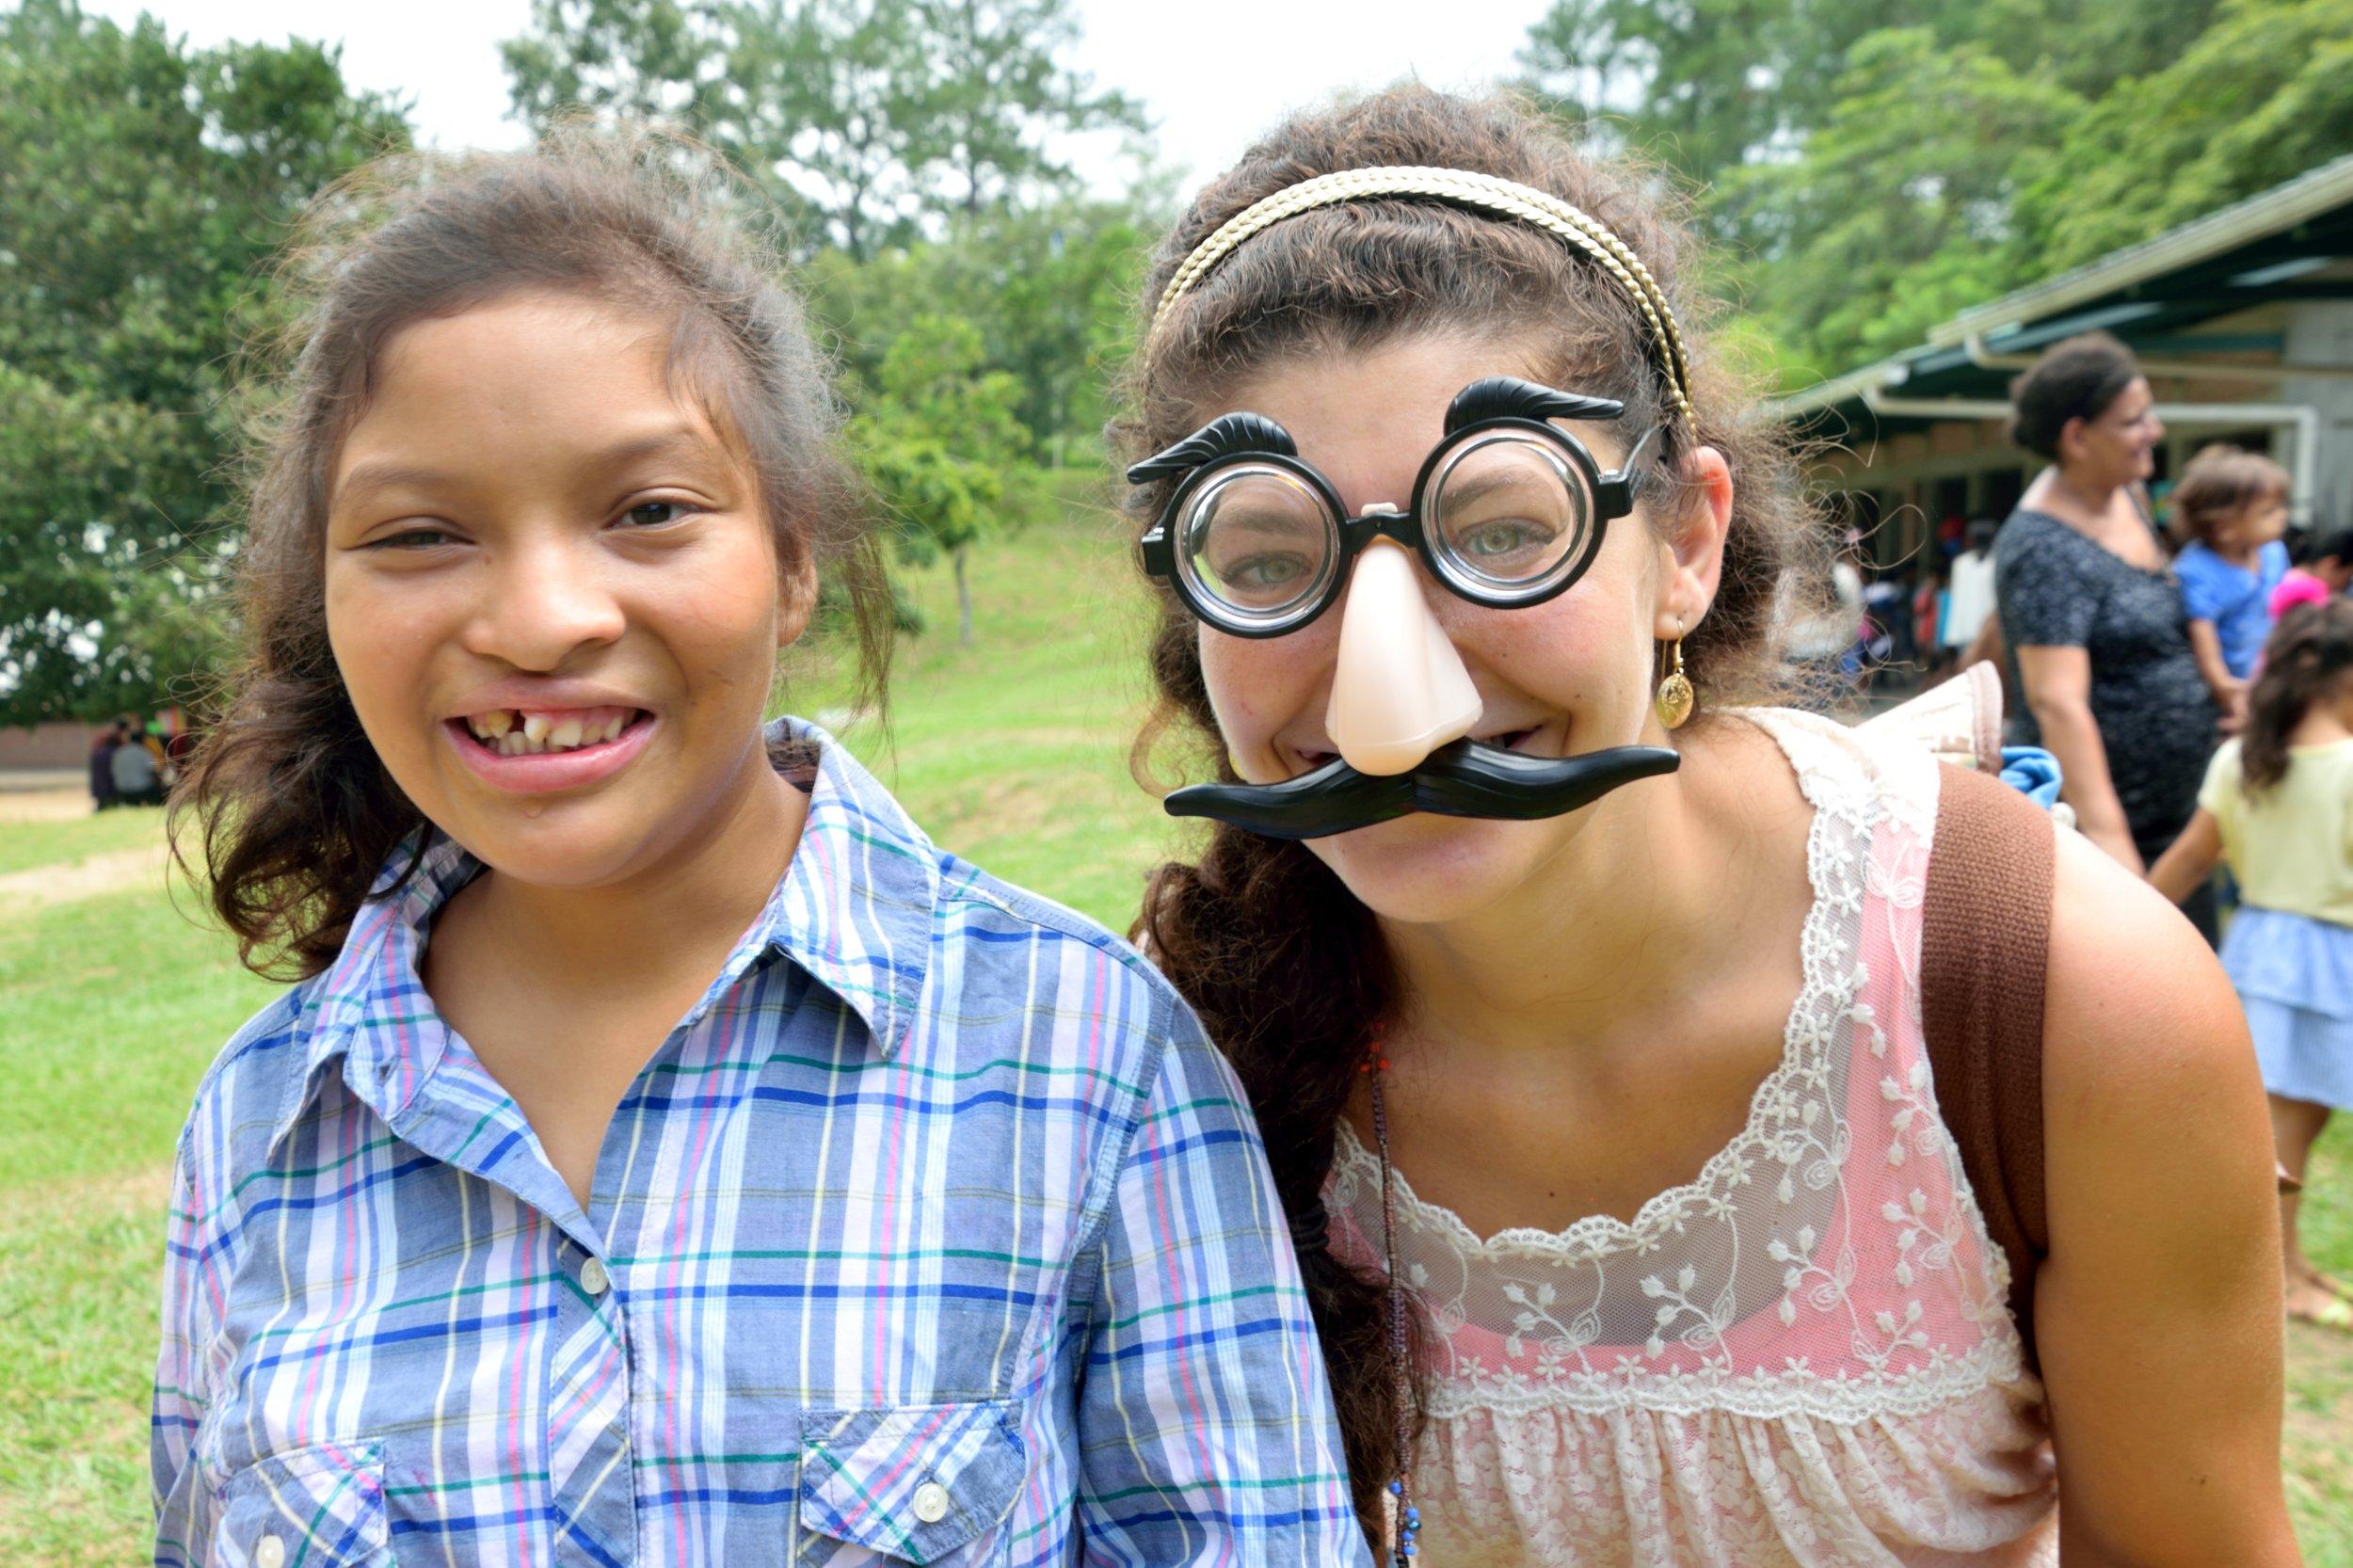 Dressed up celebrating Día del Niño (Children's Day) this past September.